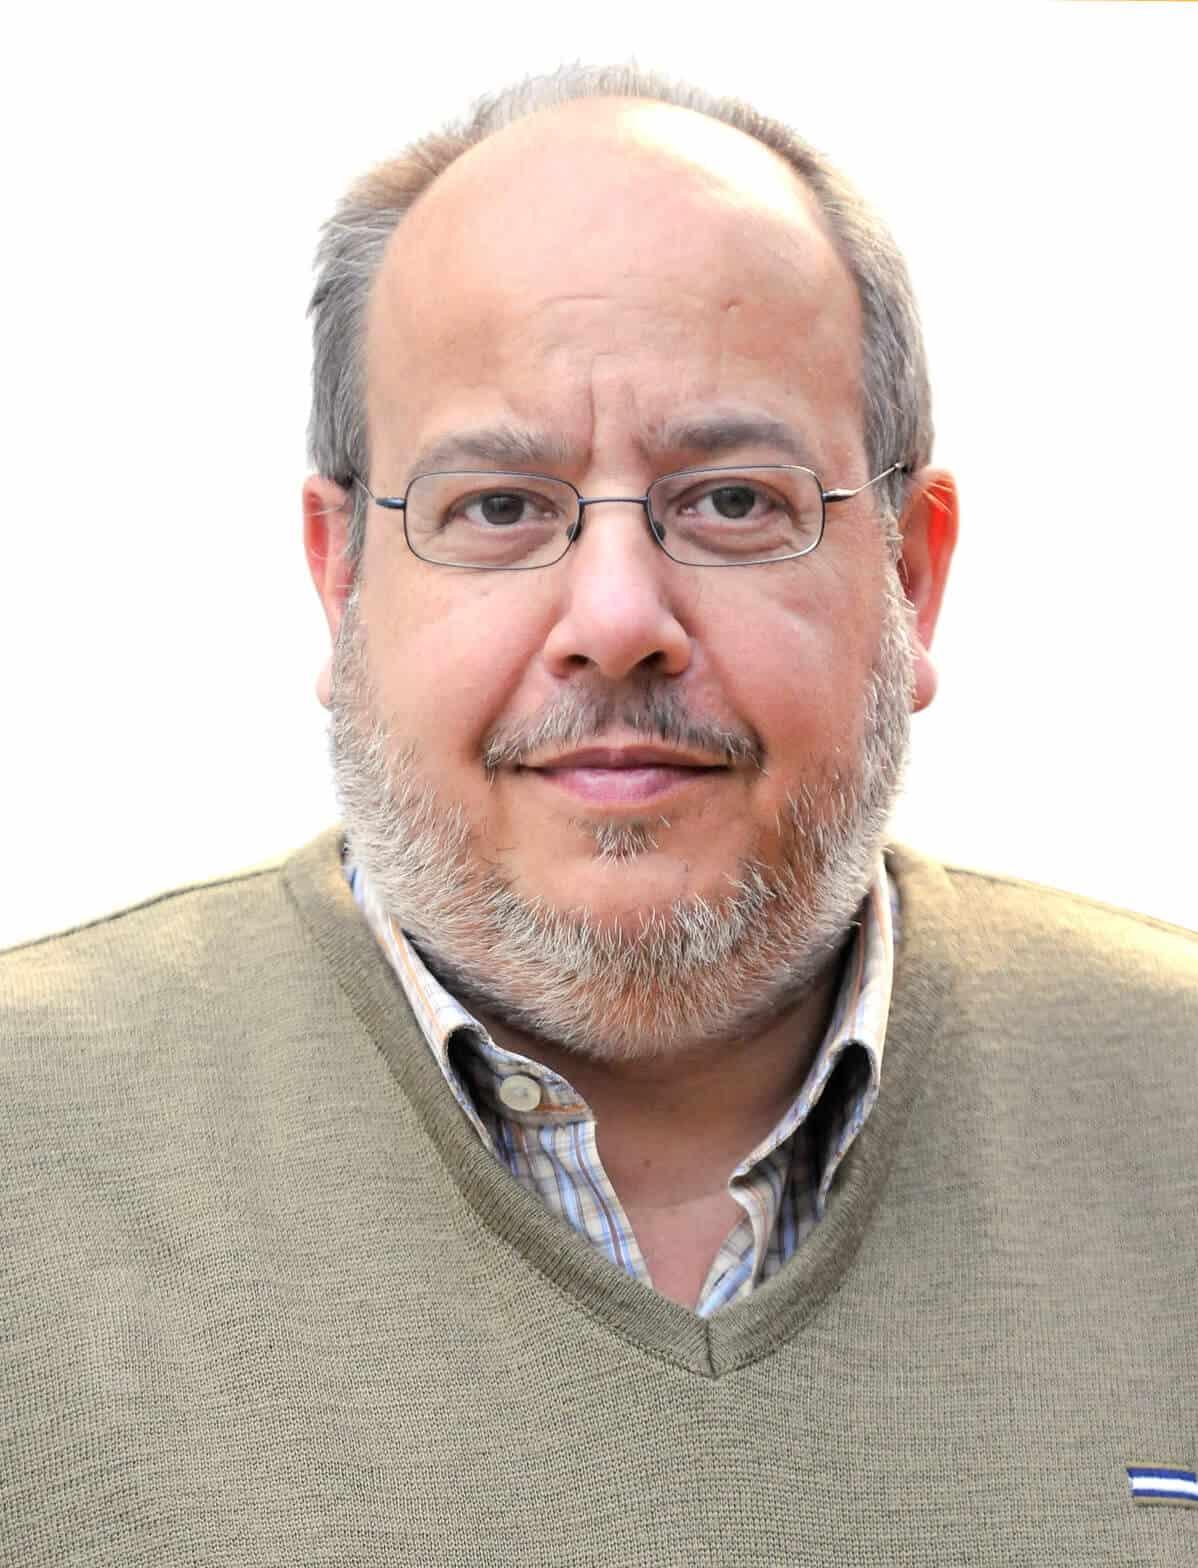 Bernard Persoons